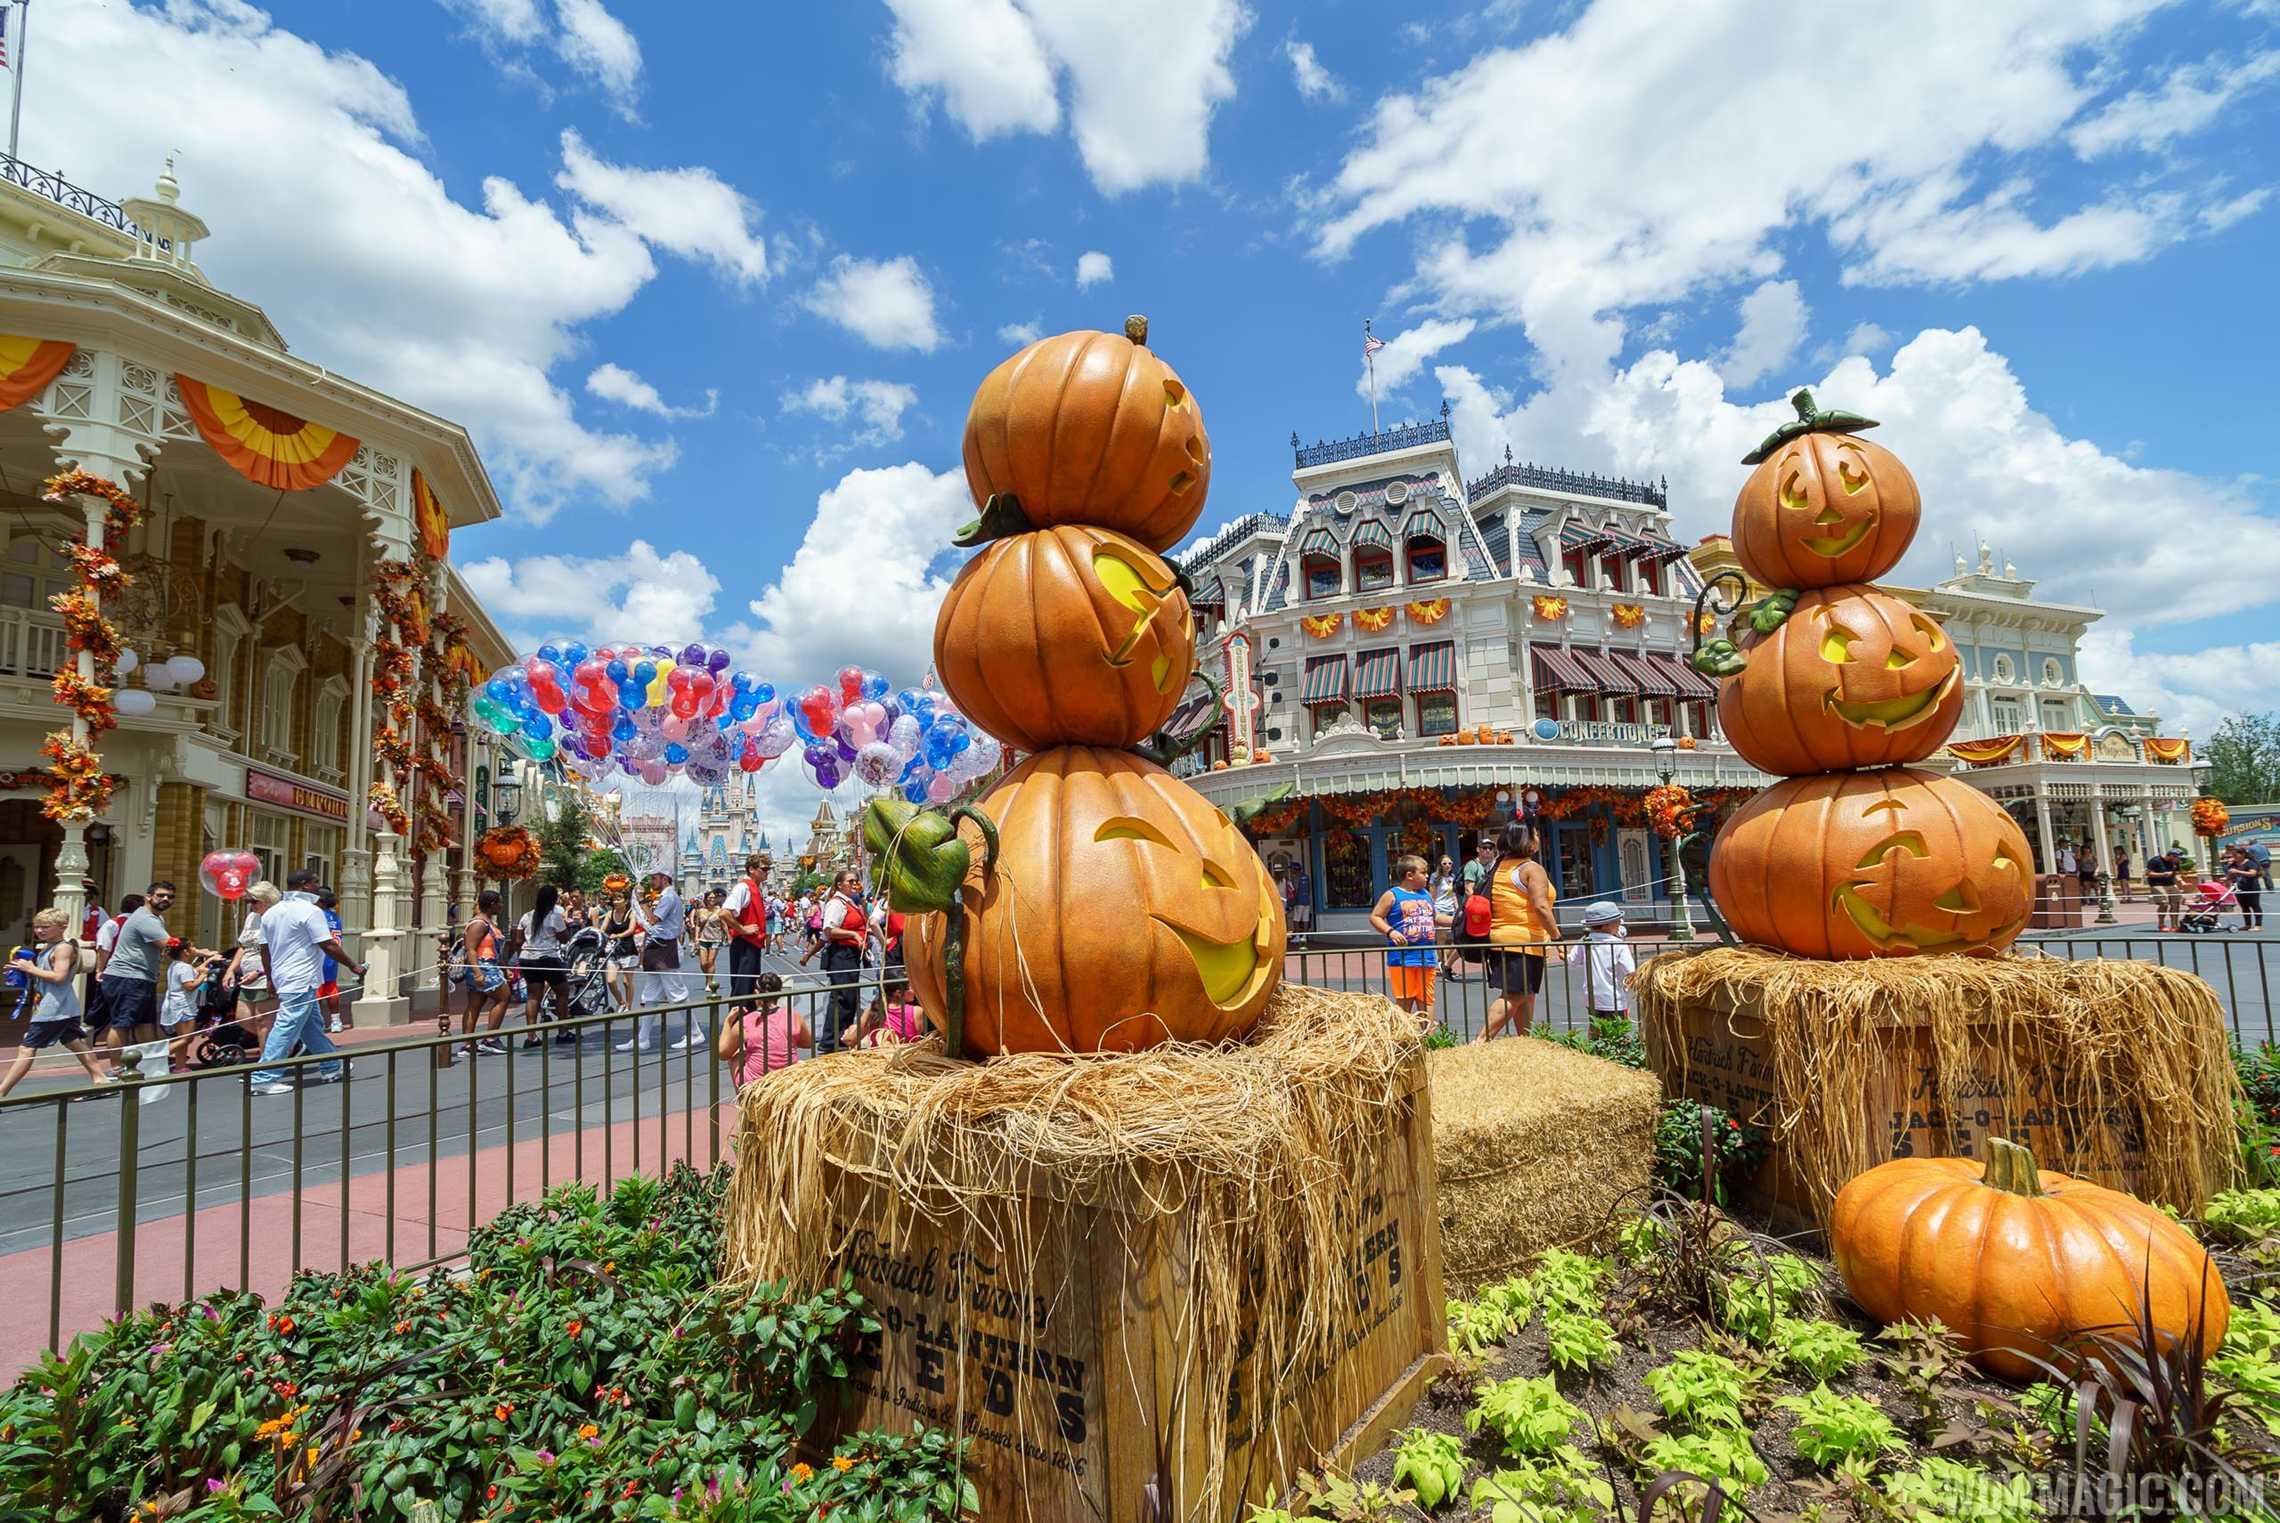 photos a look at this years magic kingdom halloween decor